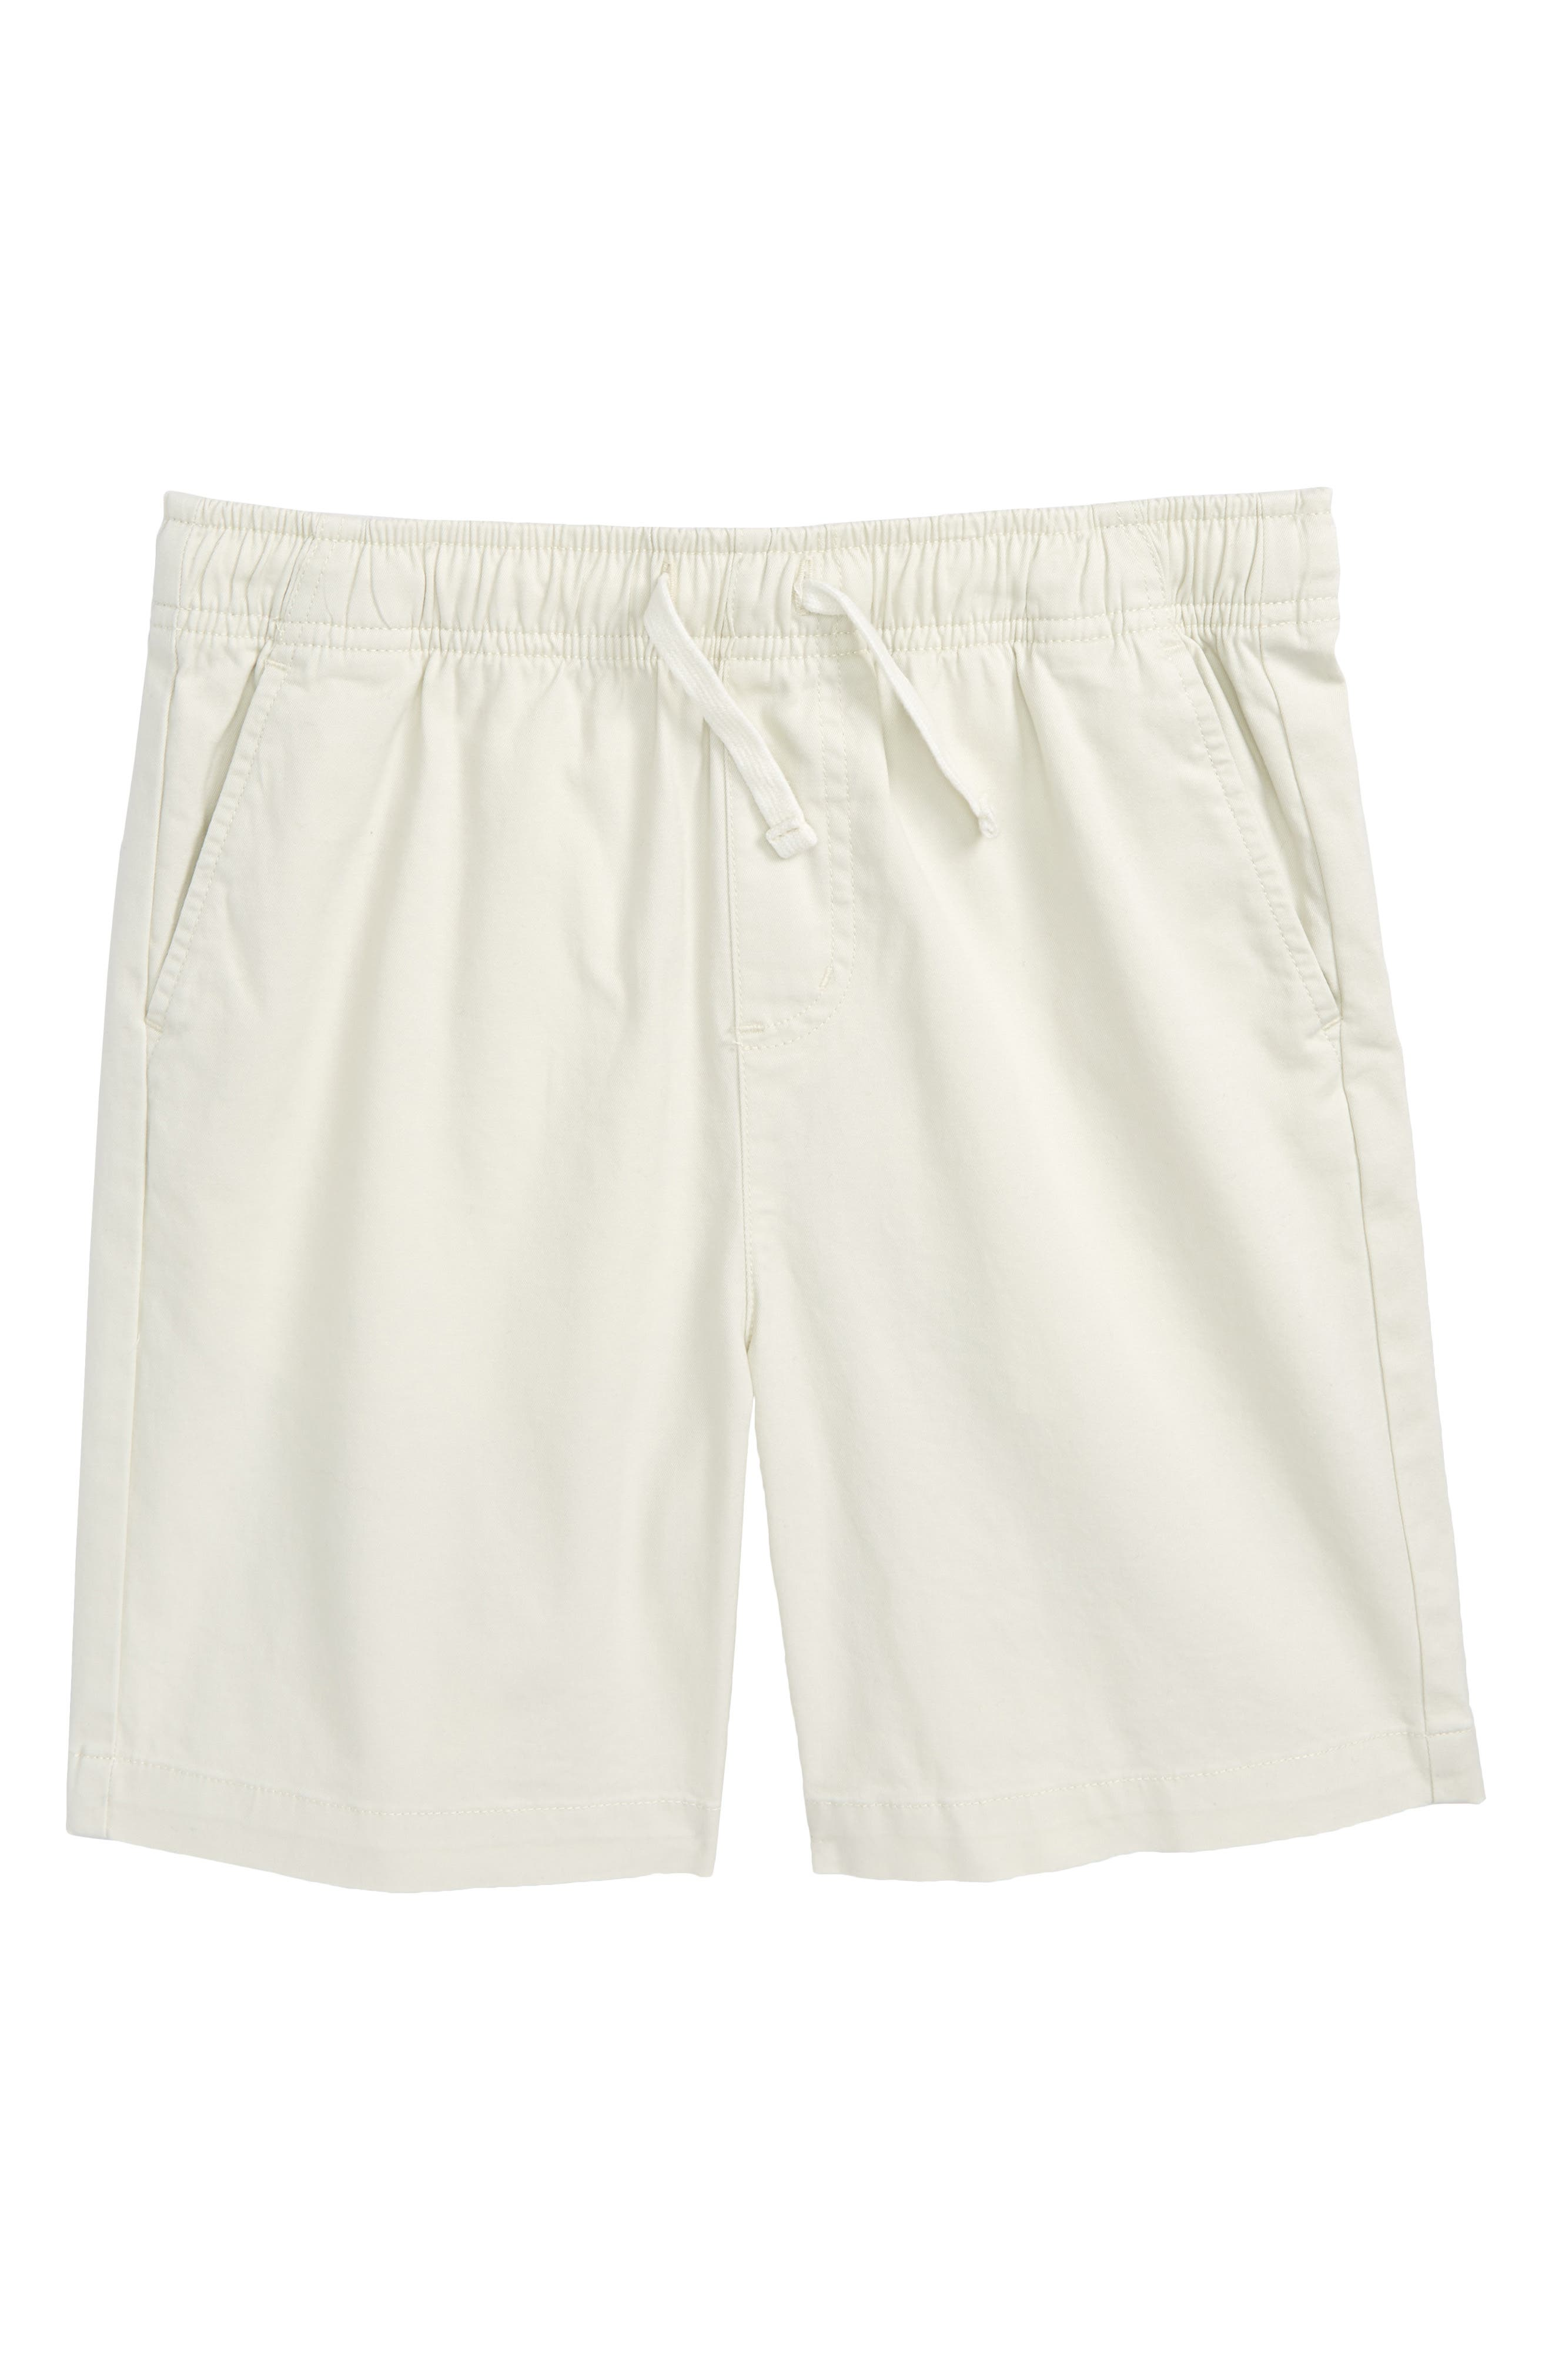 Stretch Jetty Shorts,                             Main thumbnail 1, color,                             274